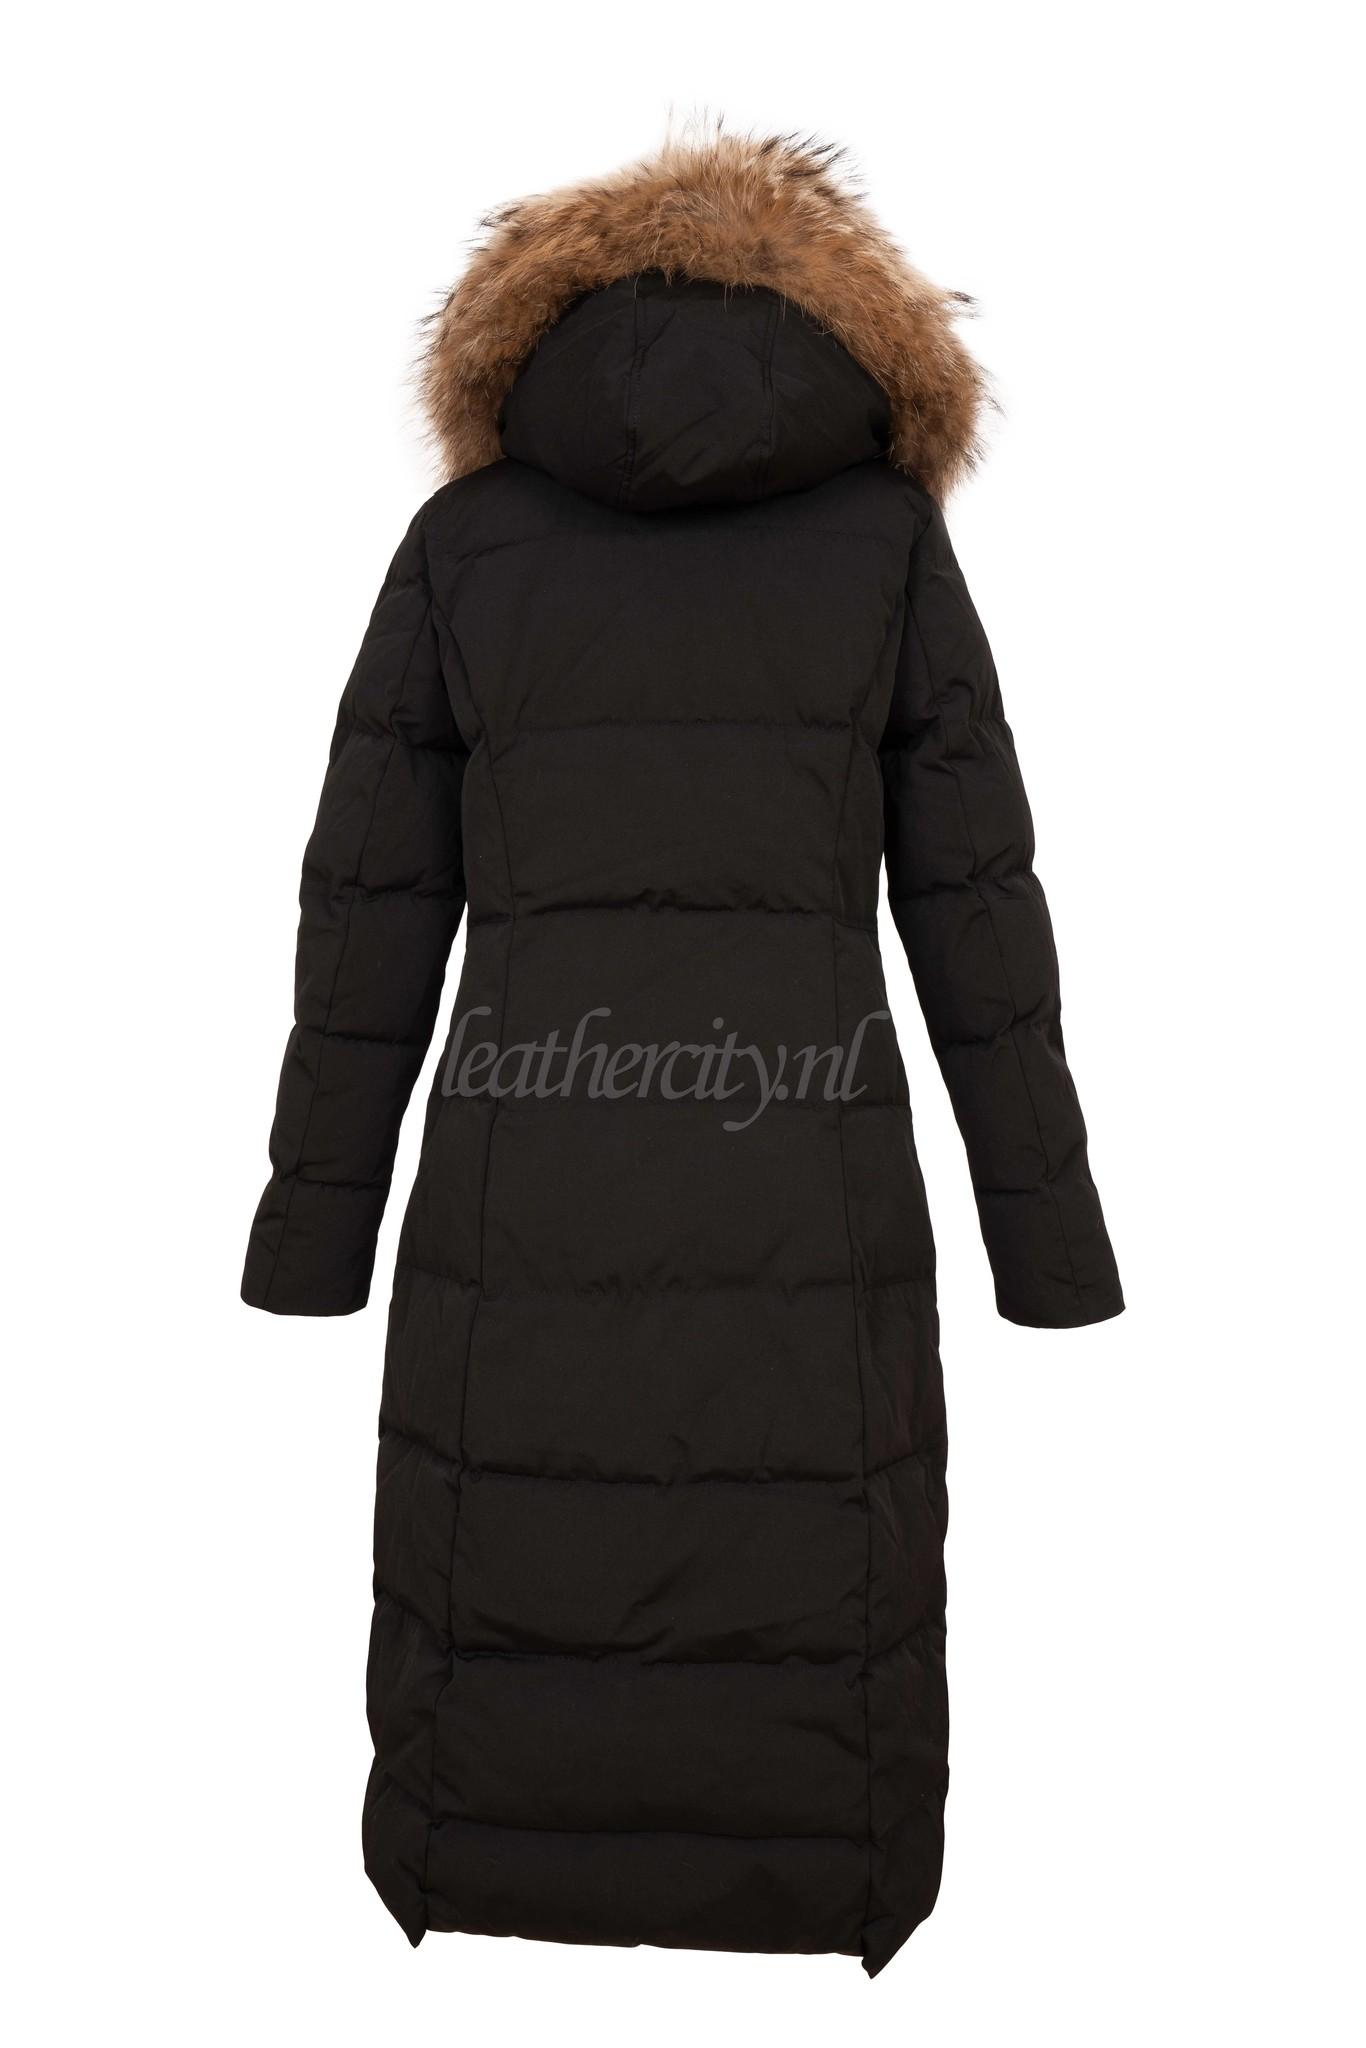 Attentif Dames winterjas zwart parka lang